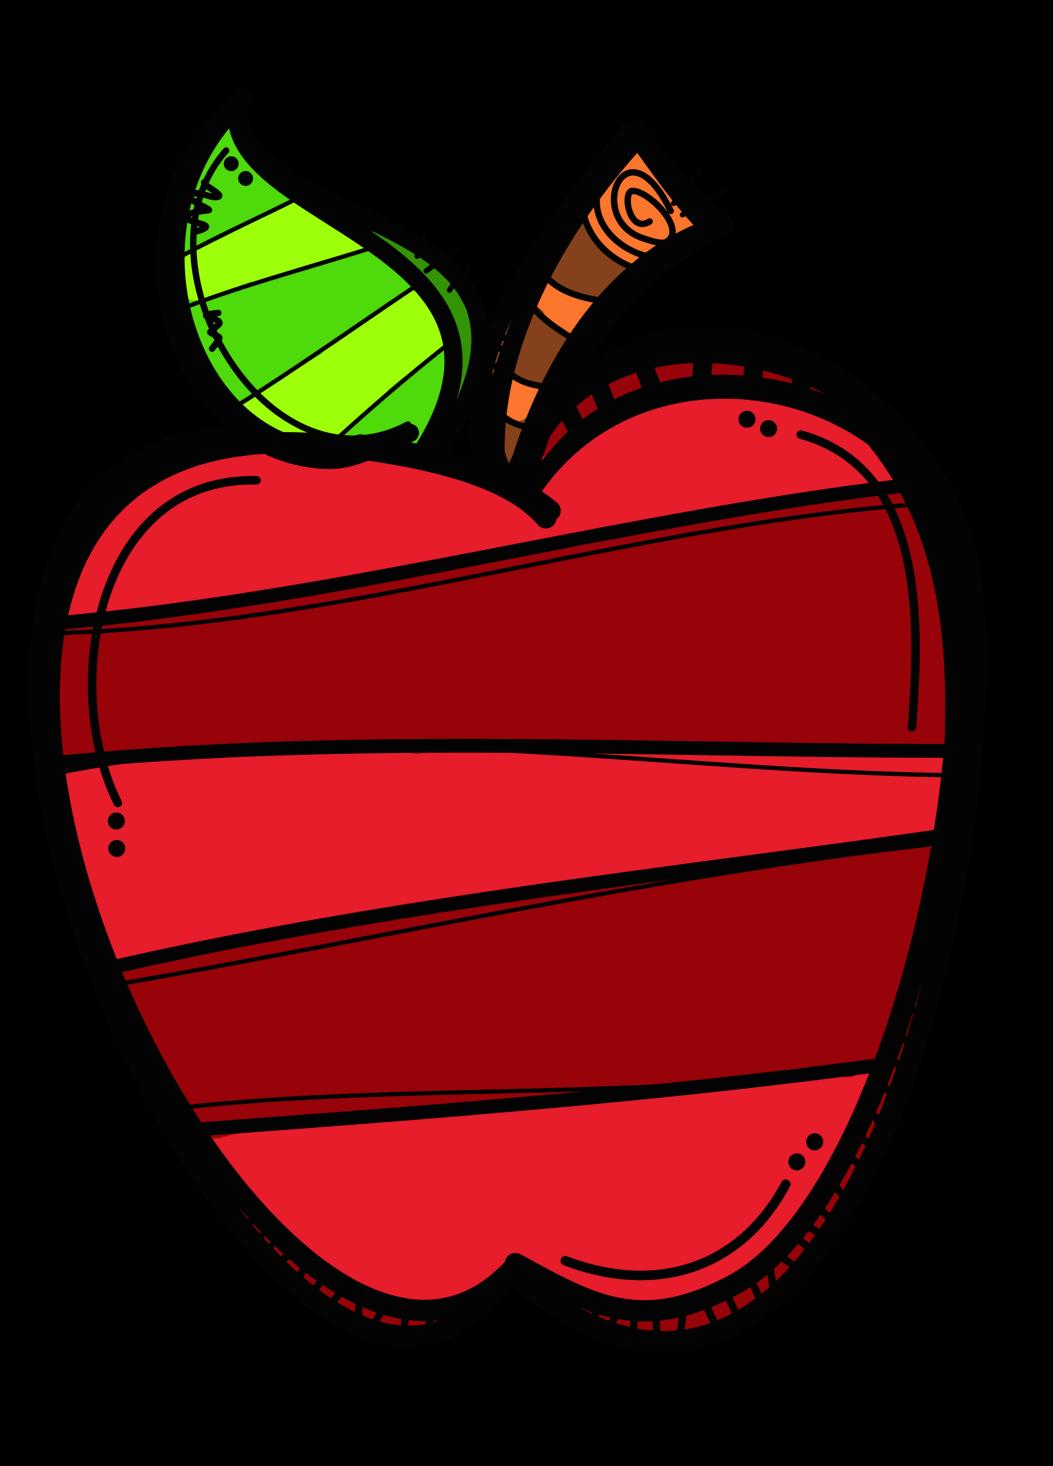 Creative Apple Red Png 1053 1466 Apple Clip Art Clip Art Palm Tree Clip Art